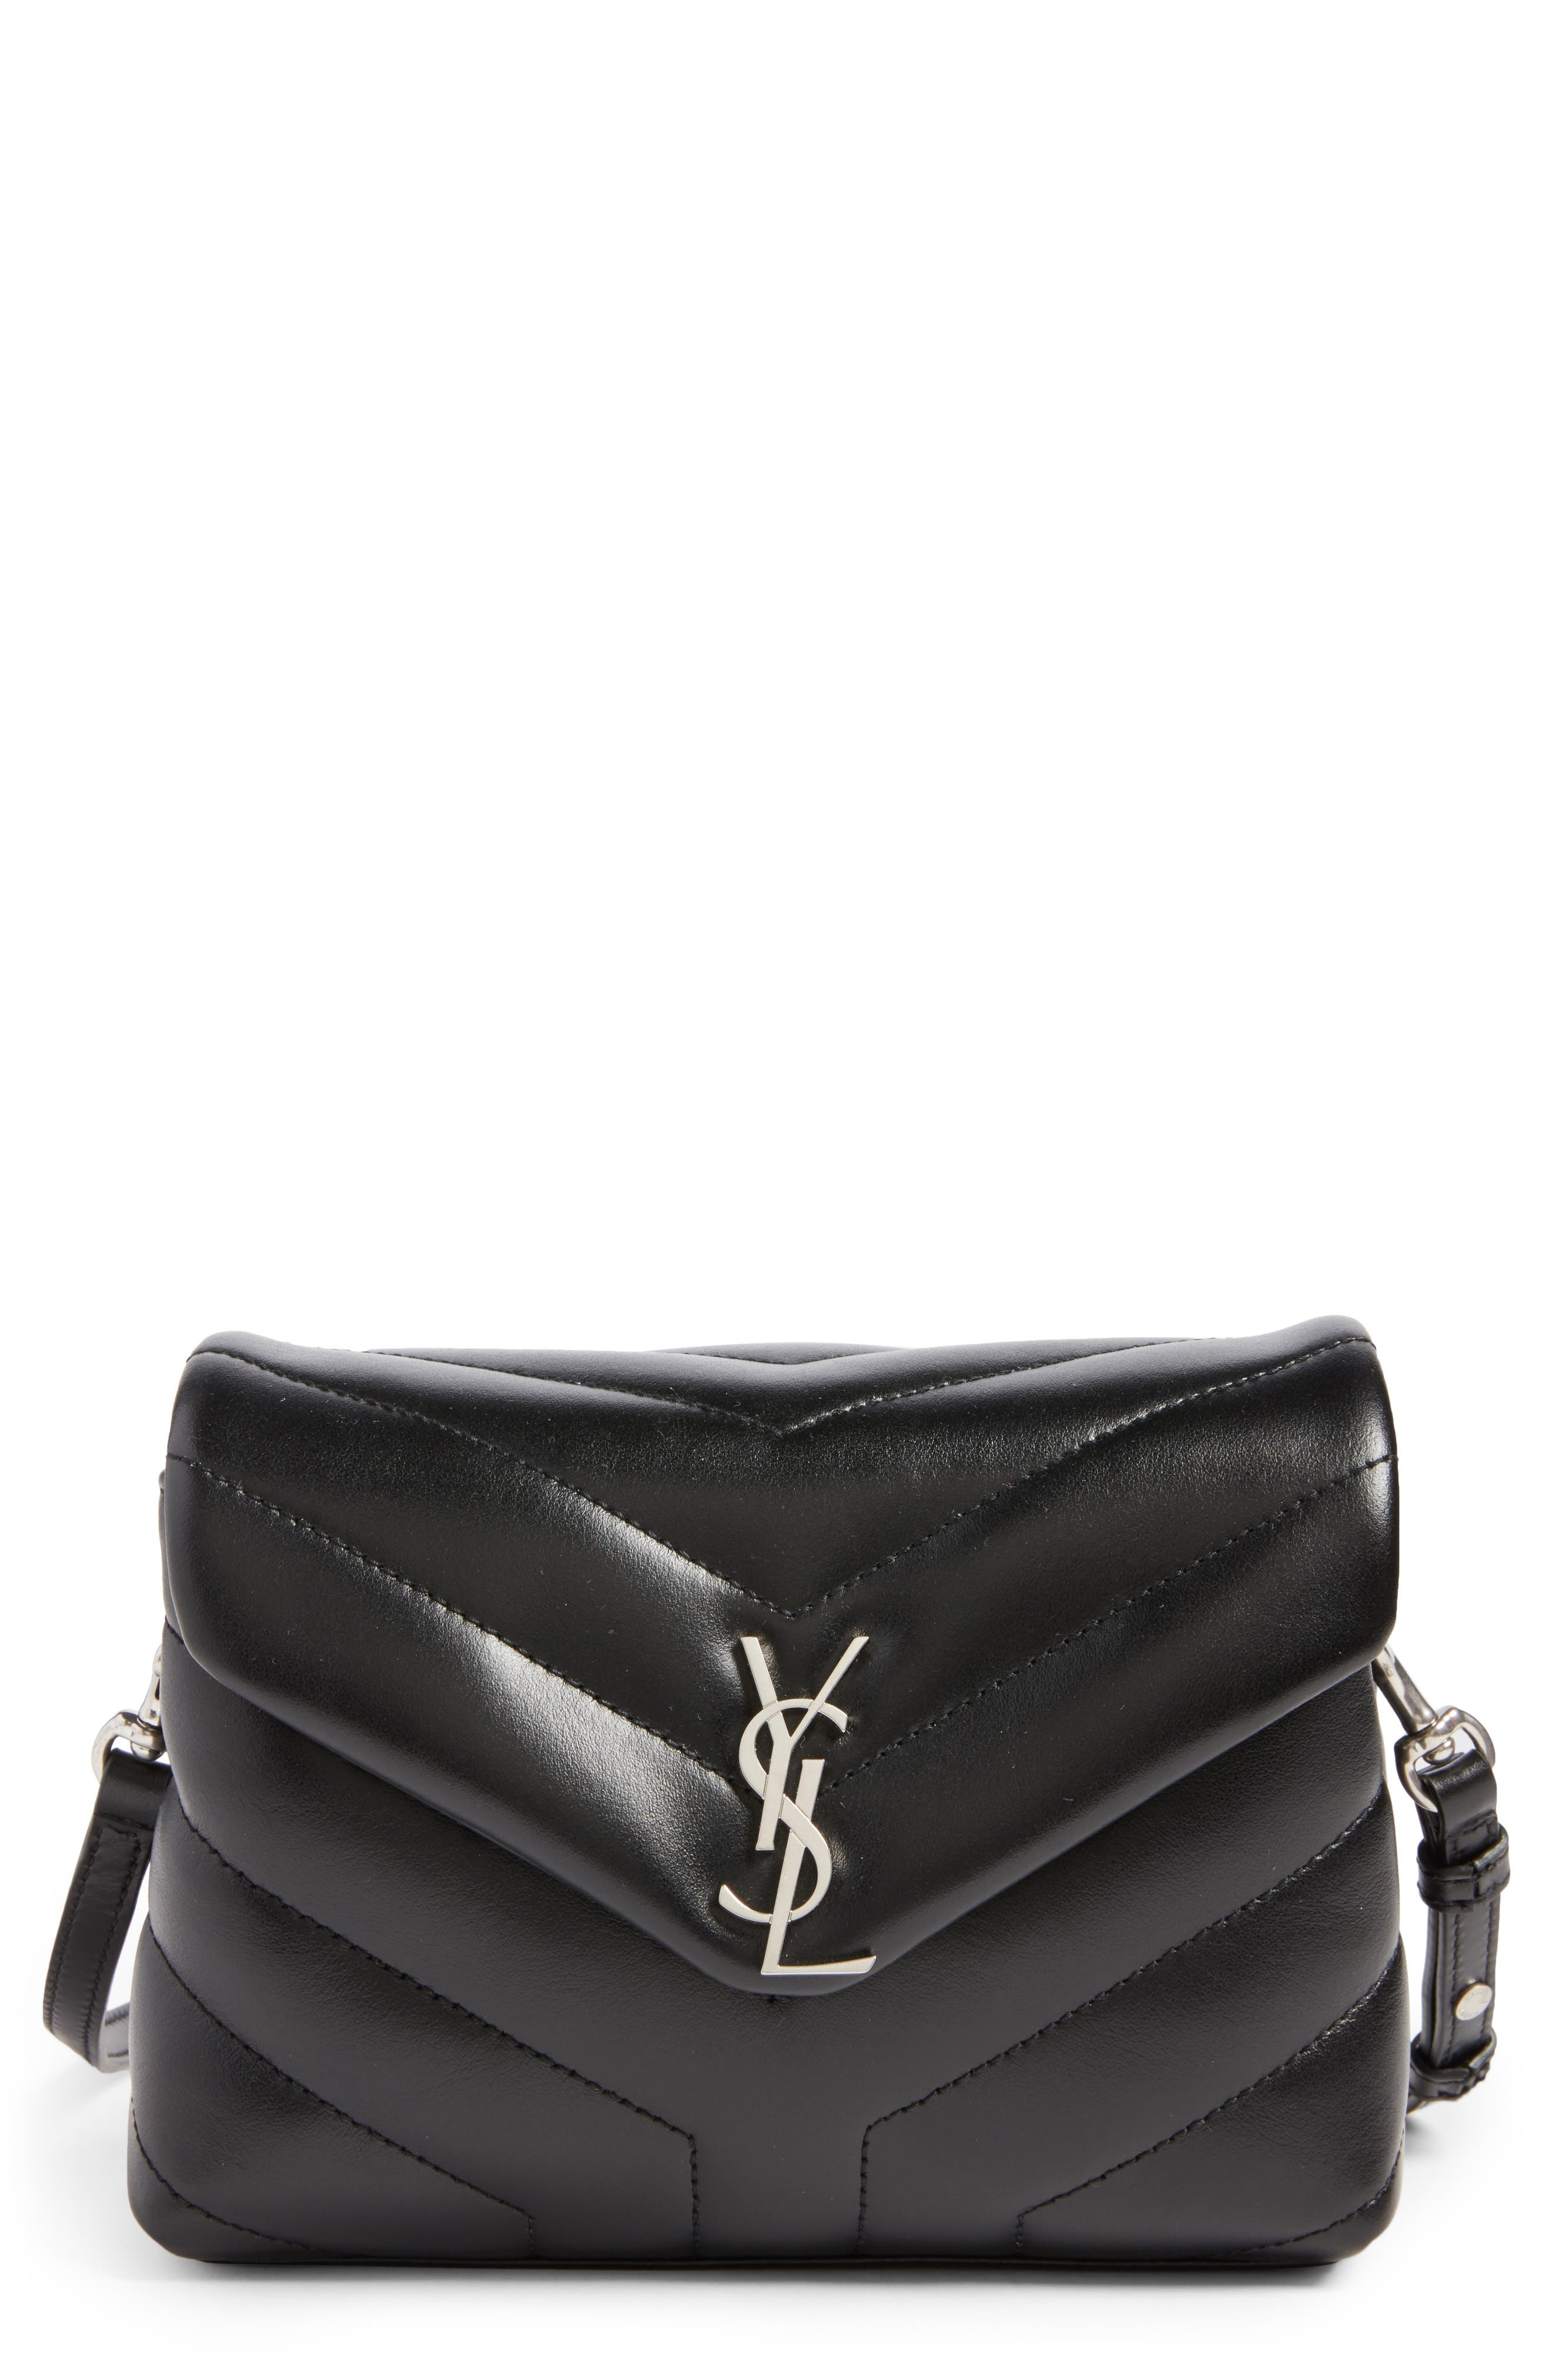 Alternate Image 1 Selected - Saint Laurent Toy LouLou Calfskin Leather Crossbody Bag